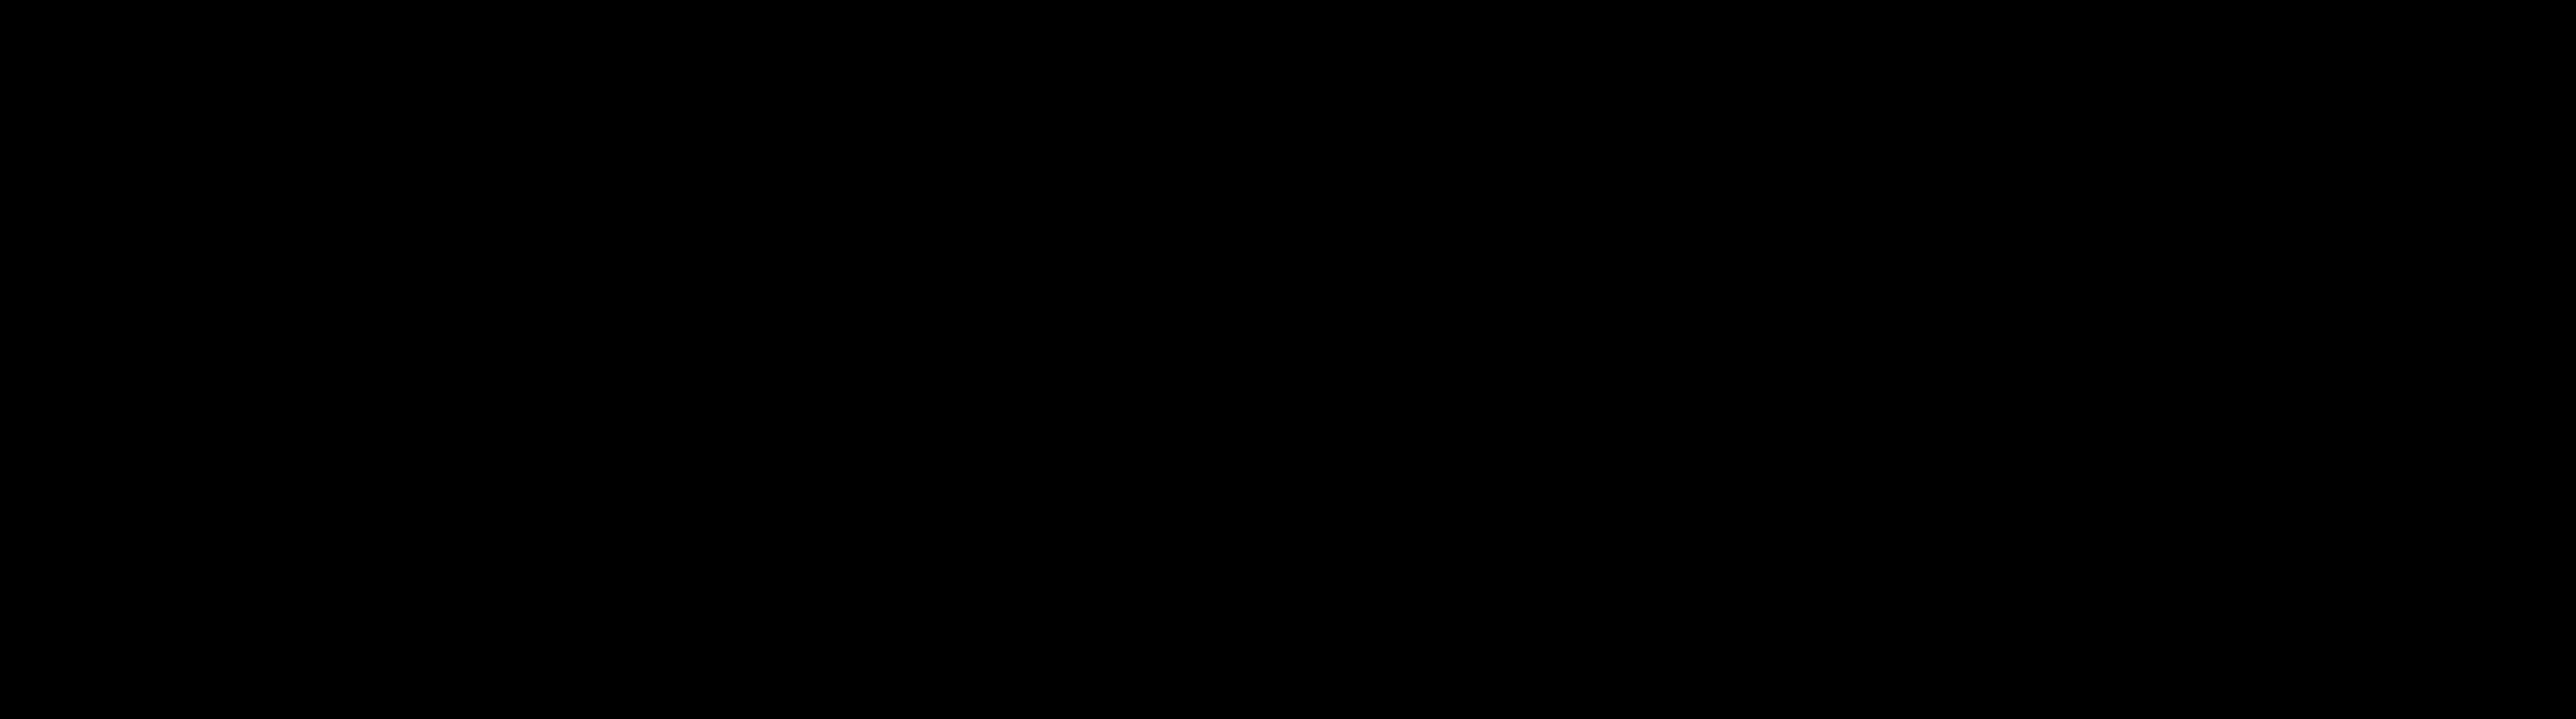 Clarks Logos.